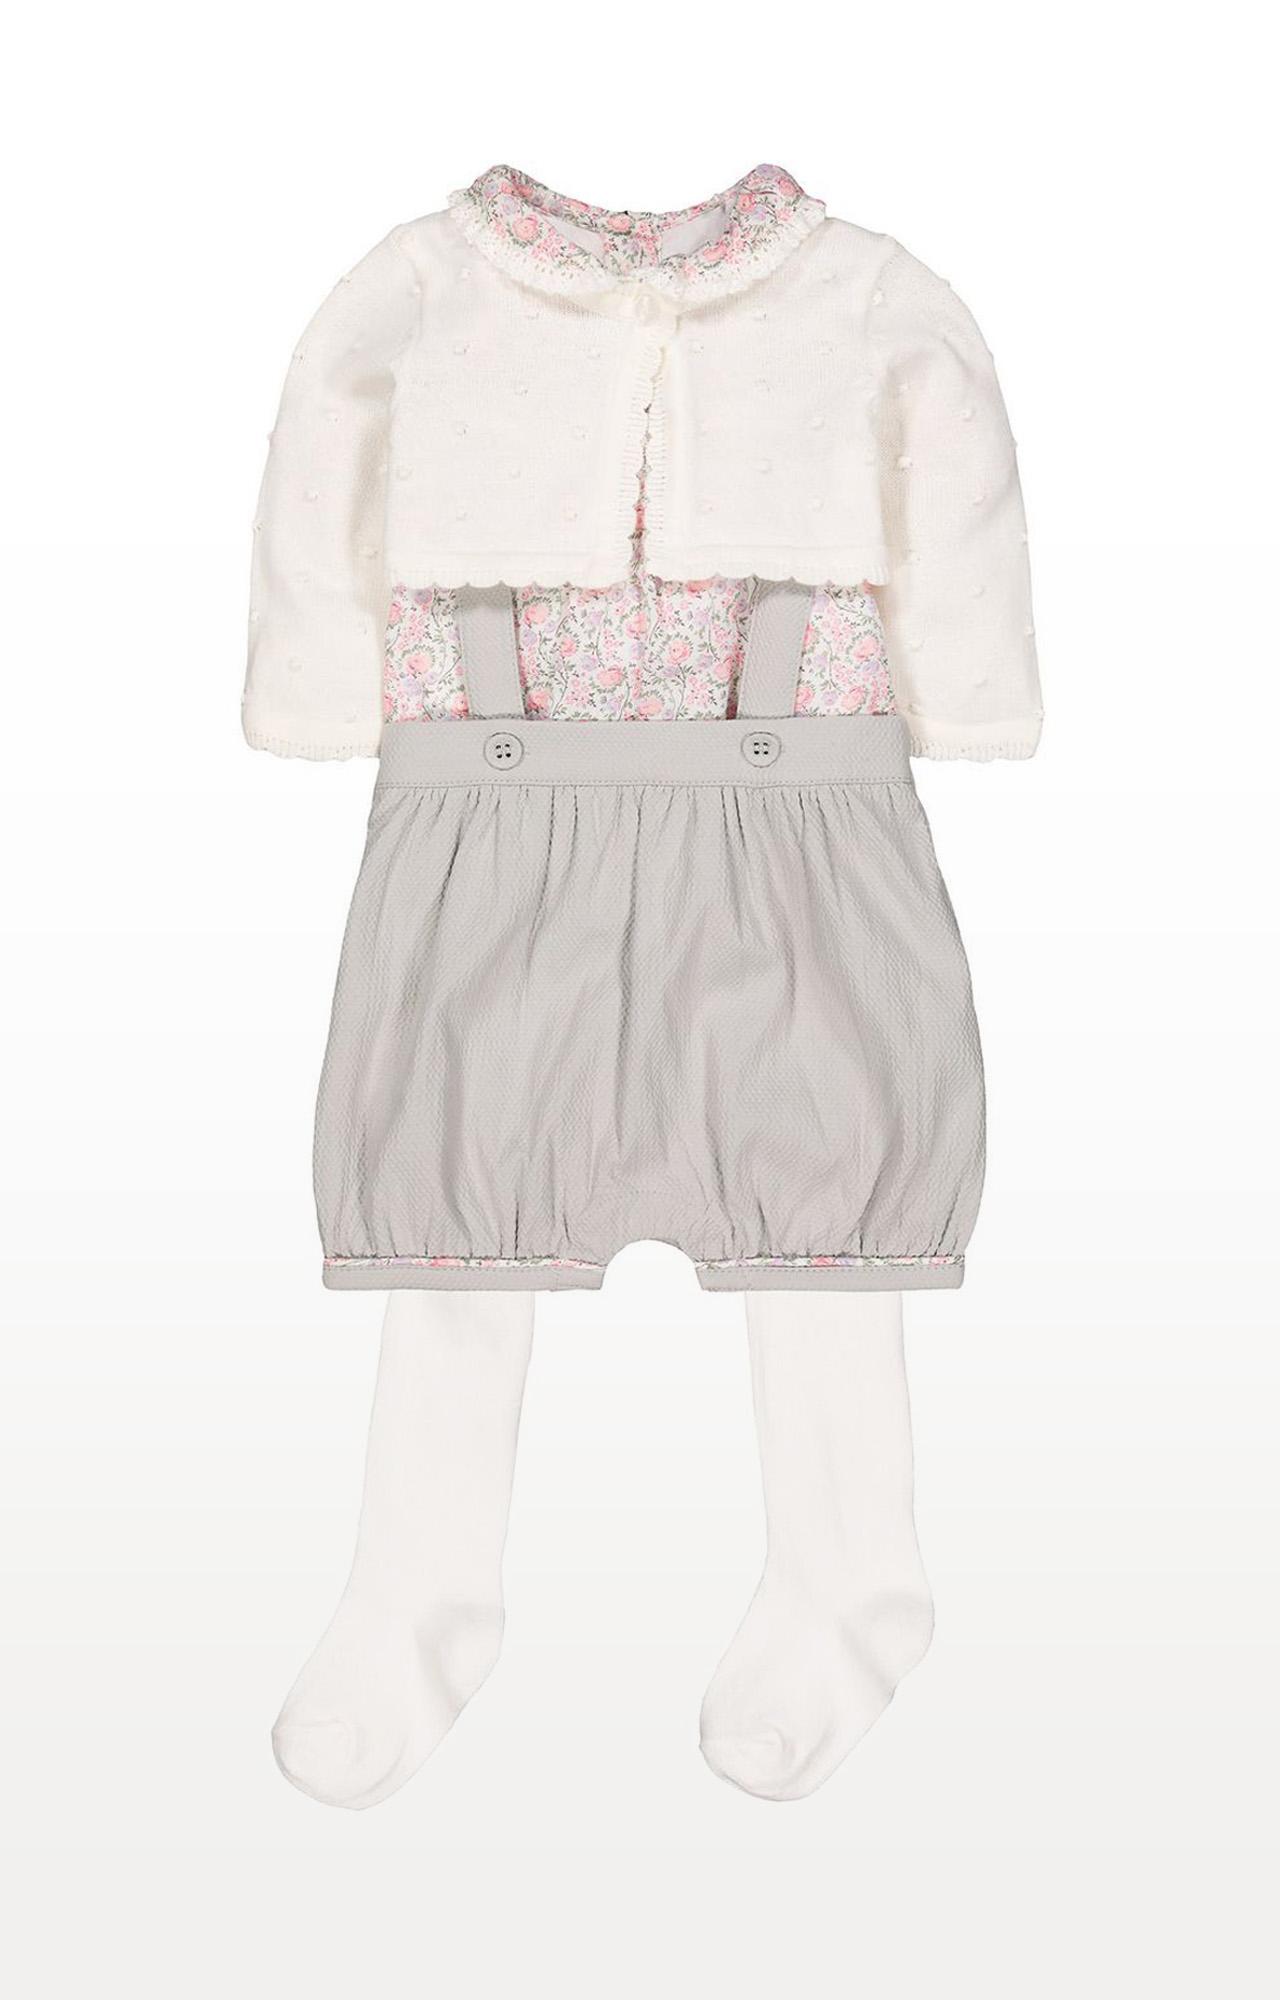 Mothercare | Grey Printed Bibshorts, Blouse, Cardigan and Tights Set